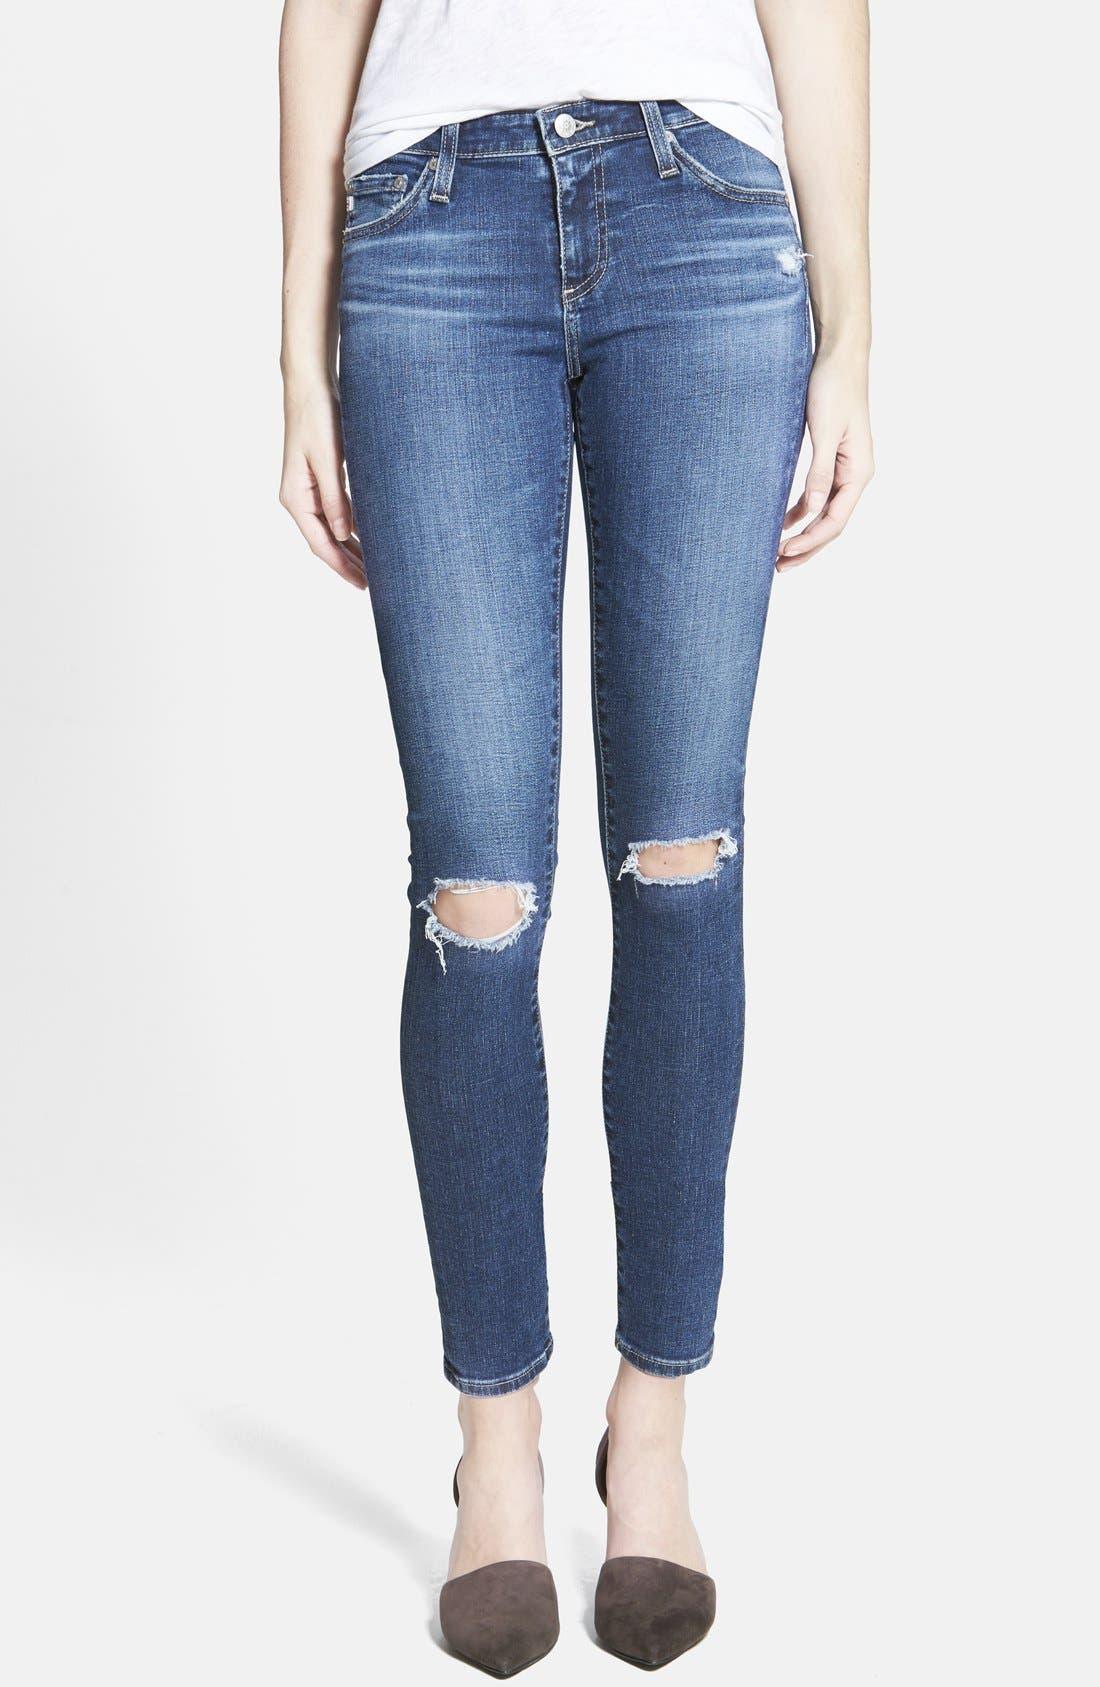 Main Image - Alexa Chung for AG 'The Legging' Ankle Jeans (11 Year Dreamer)